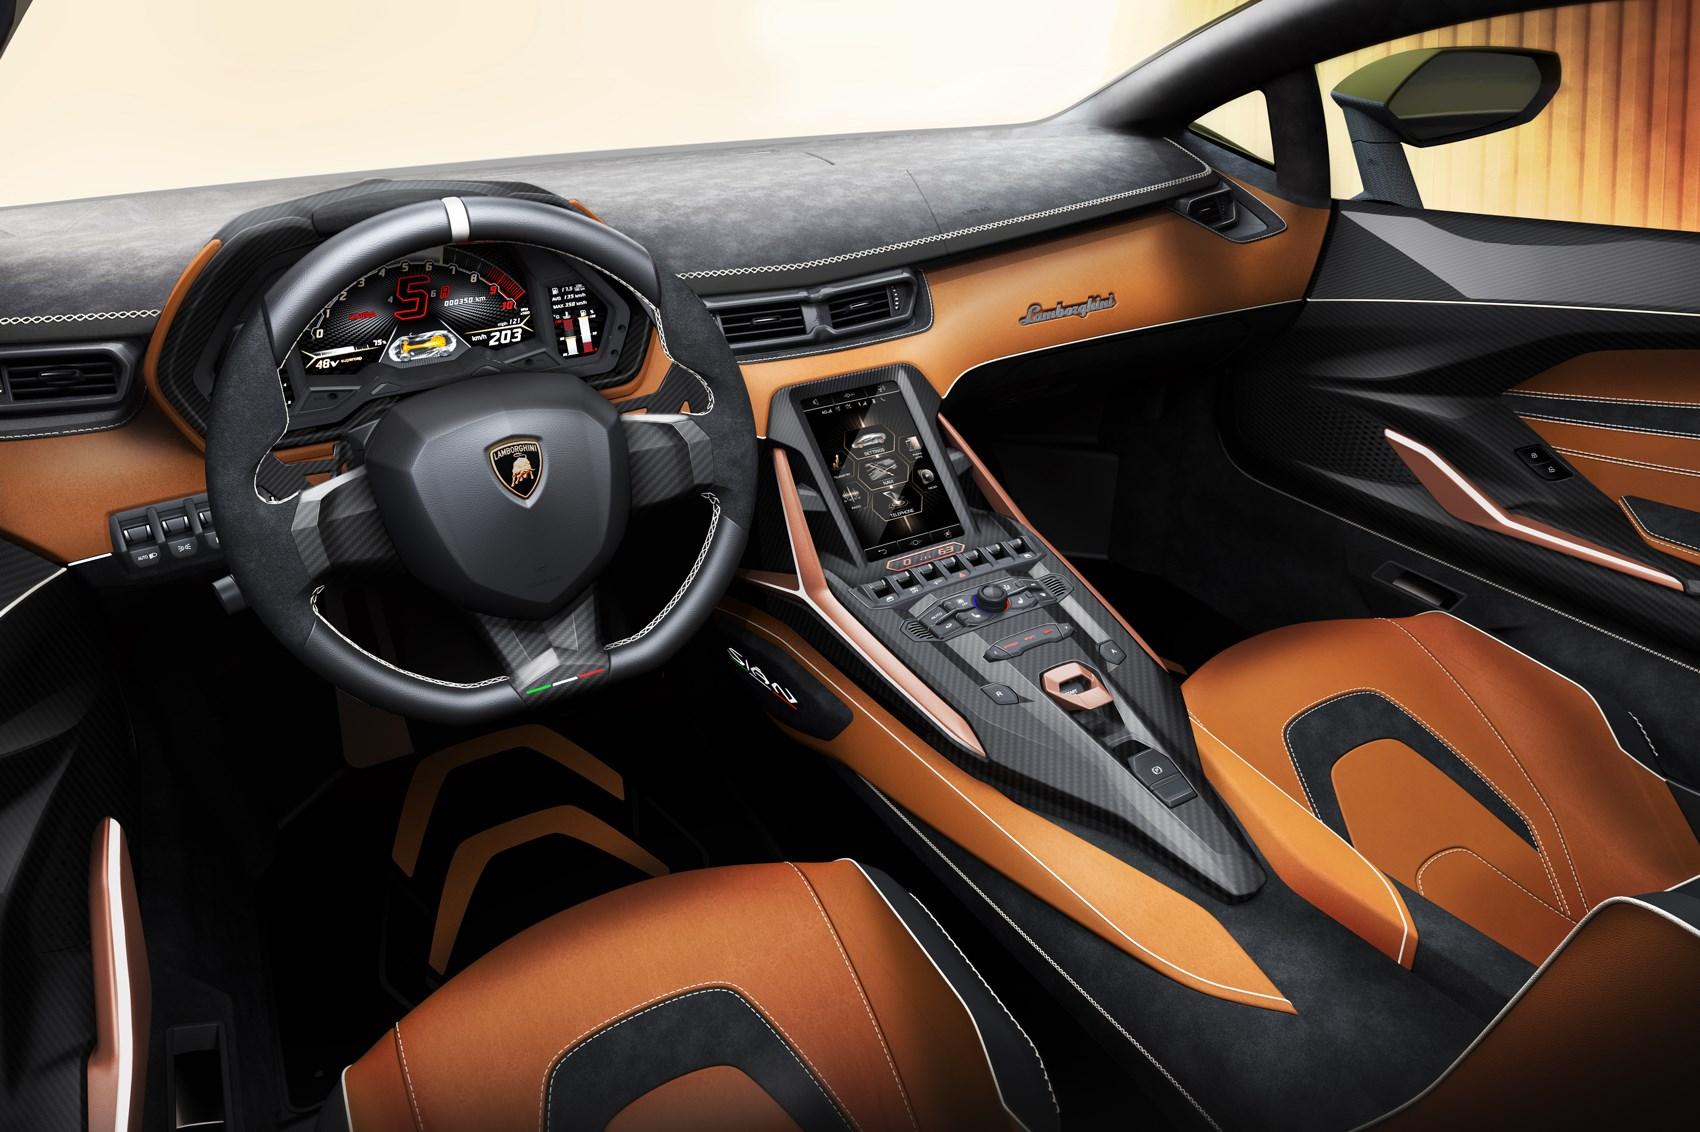 Lamborghini Sian hybrid sportscar makes global debut